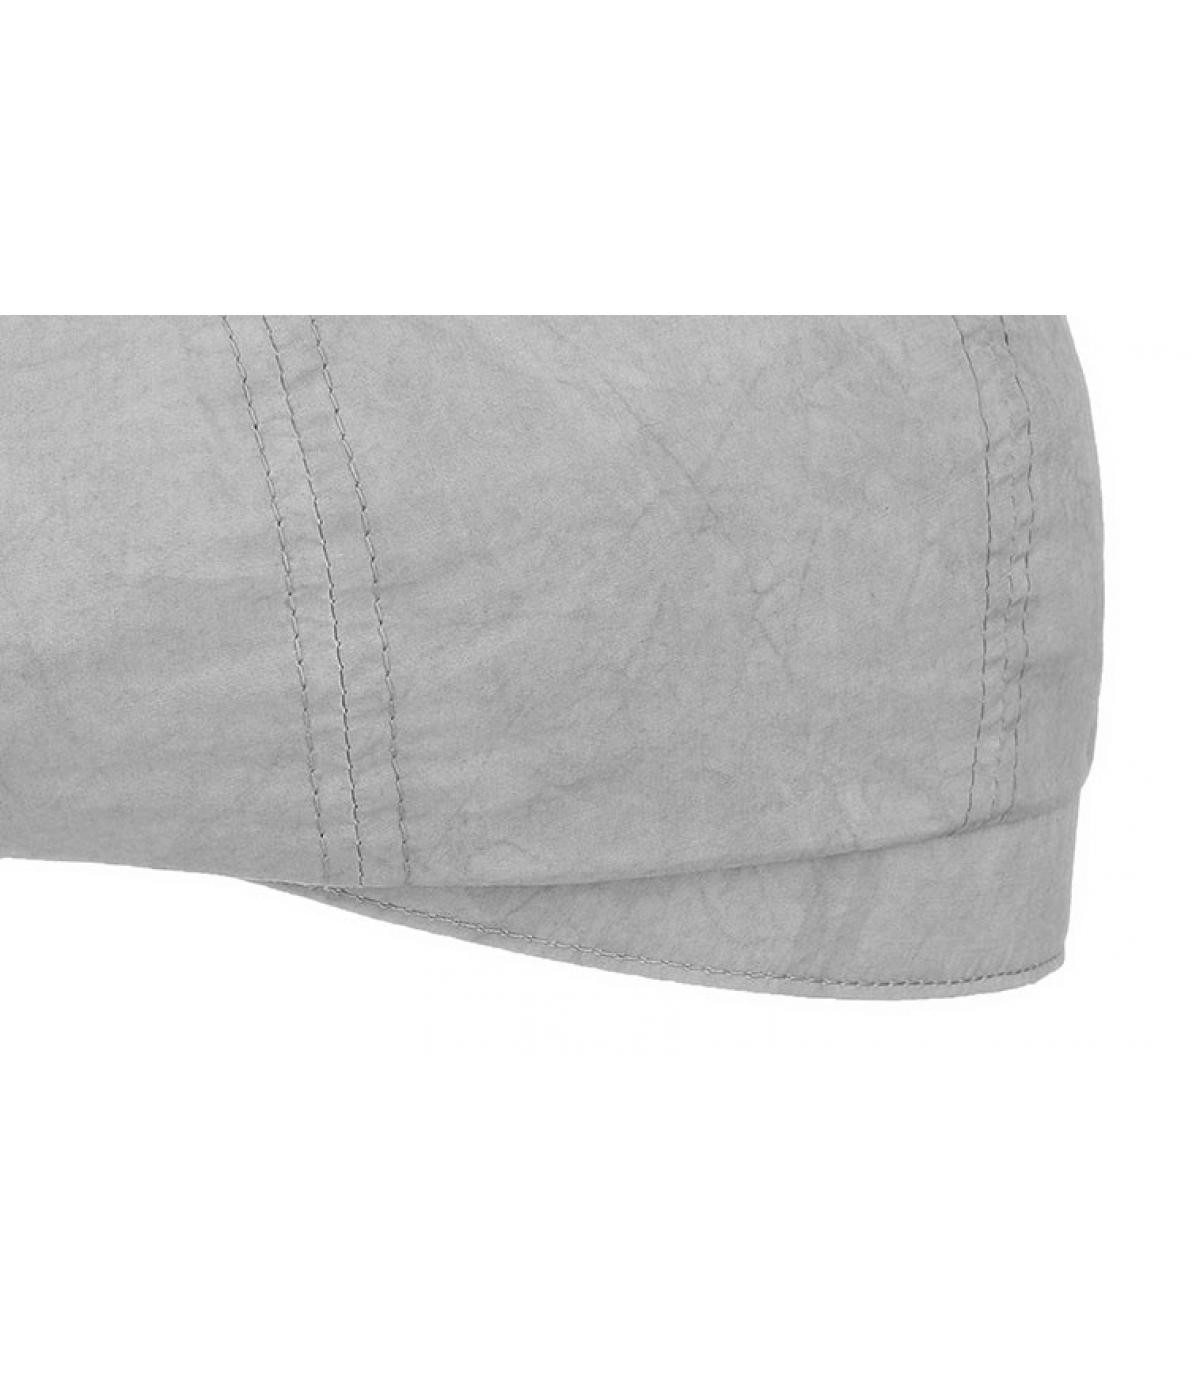 Détails Hatteras light weight coton grey - image 3